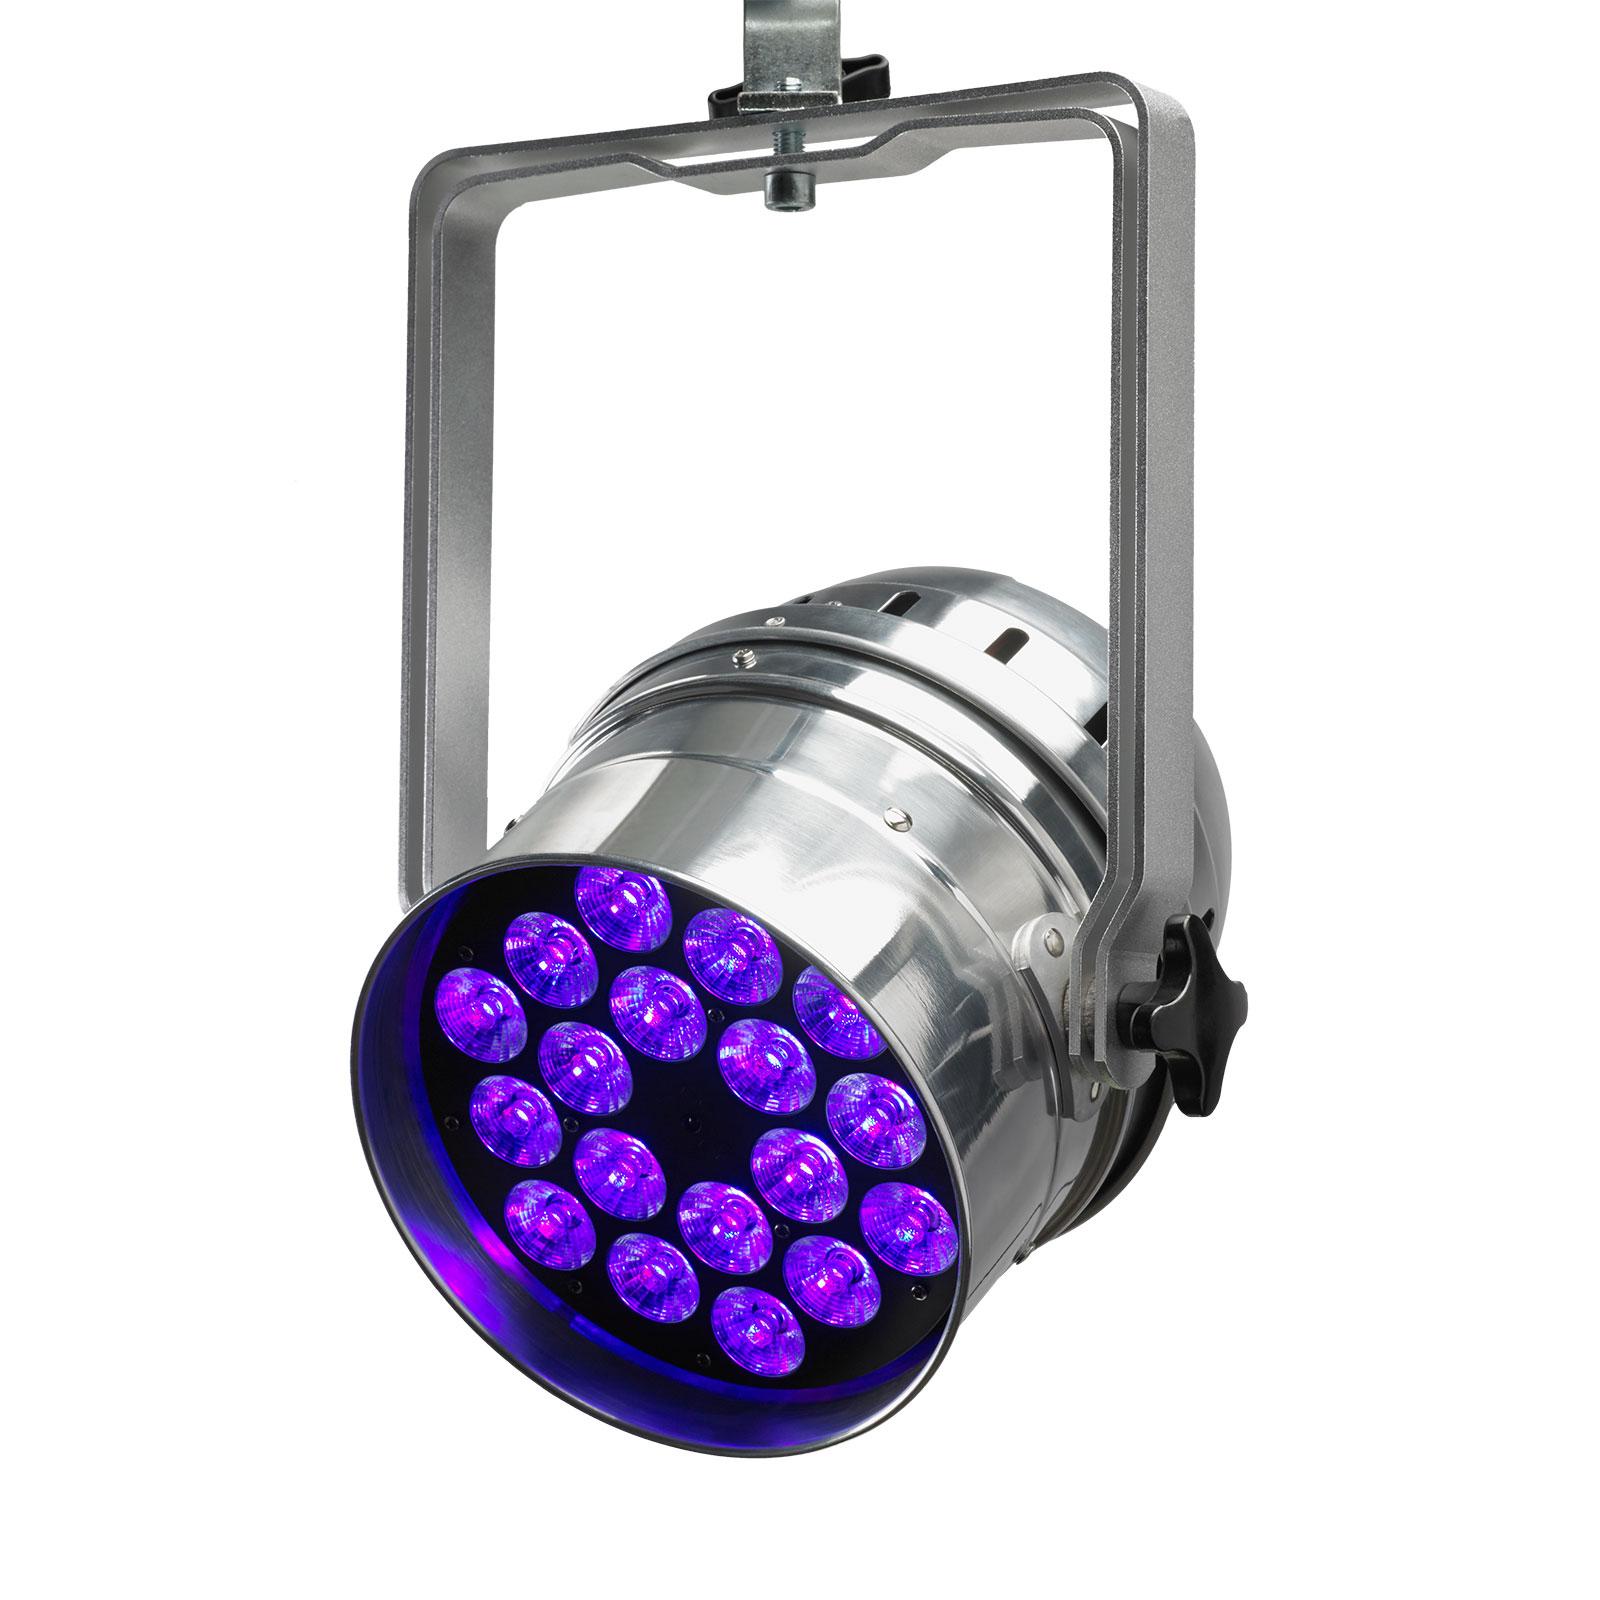 Contest irLED64-18x12SIXss LED Scheinwerfer